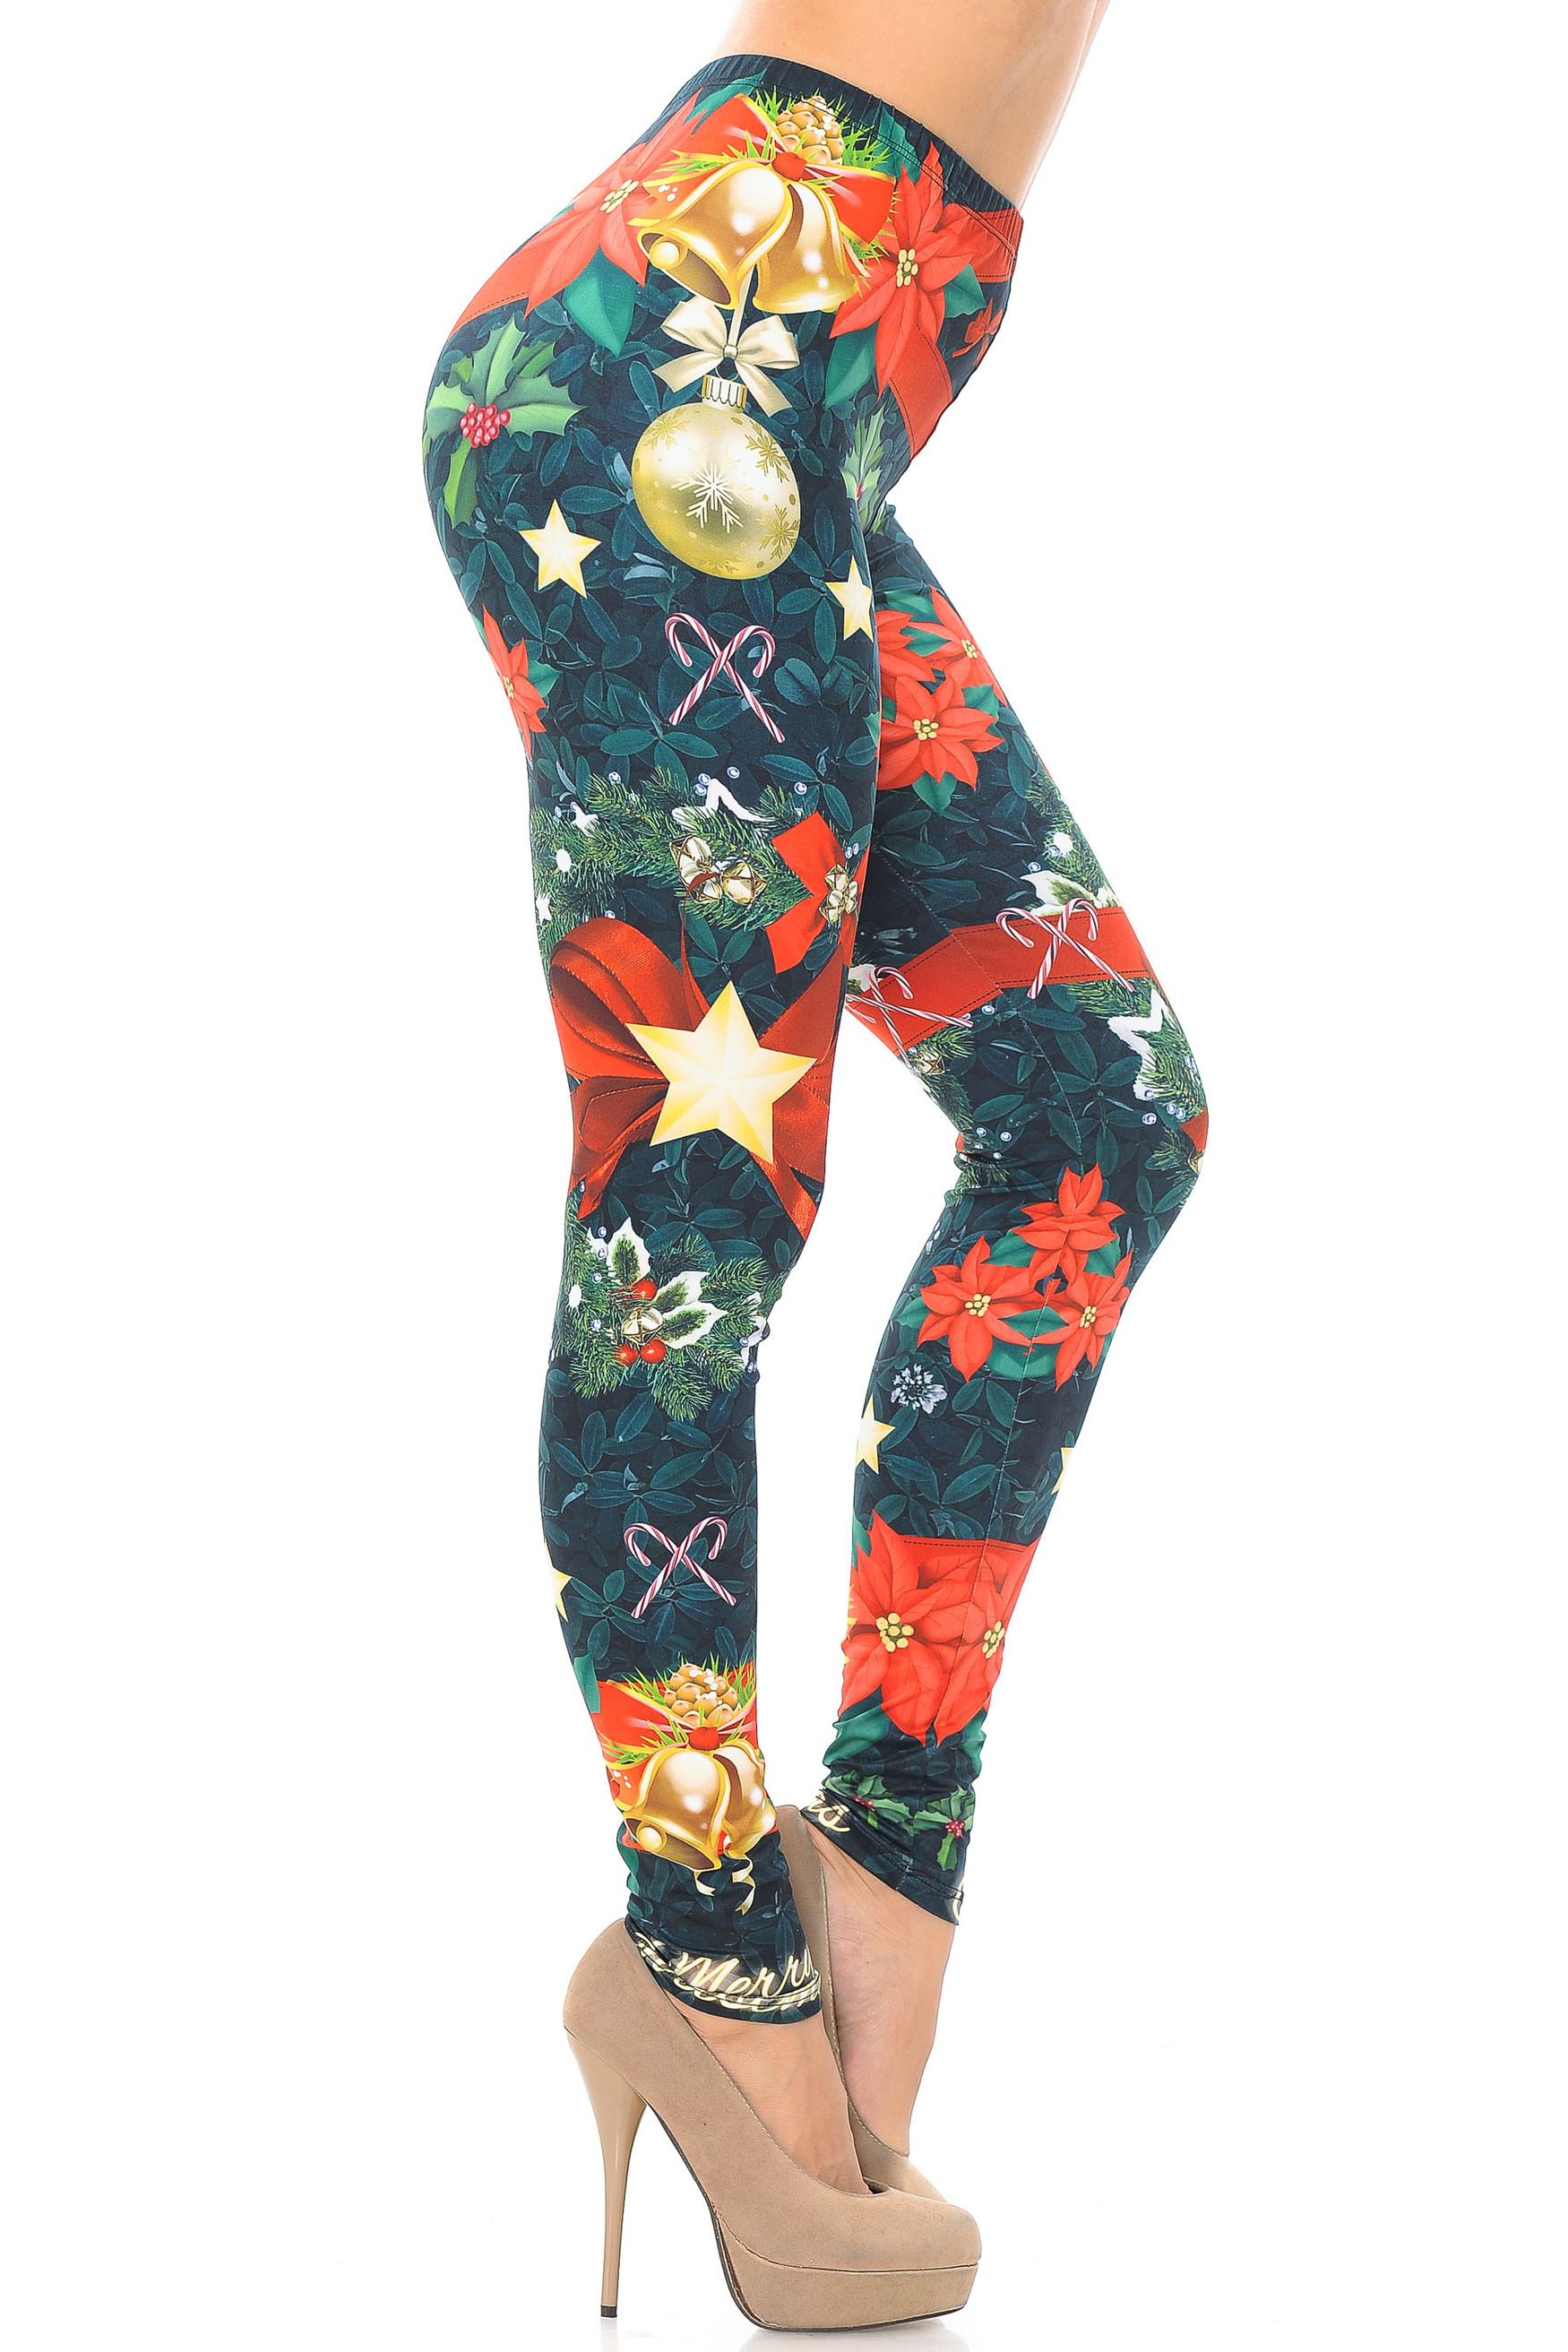 Creamy Soft Christmas Bows and Wreaths Extra Plus Size Leggings - 3X-5X - USA Fashion™